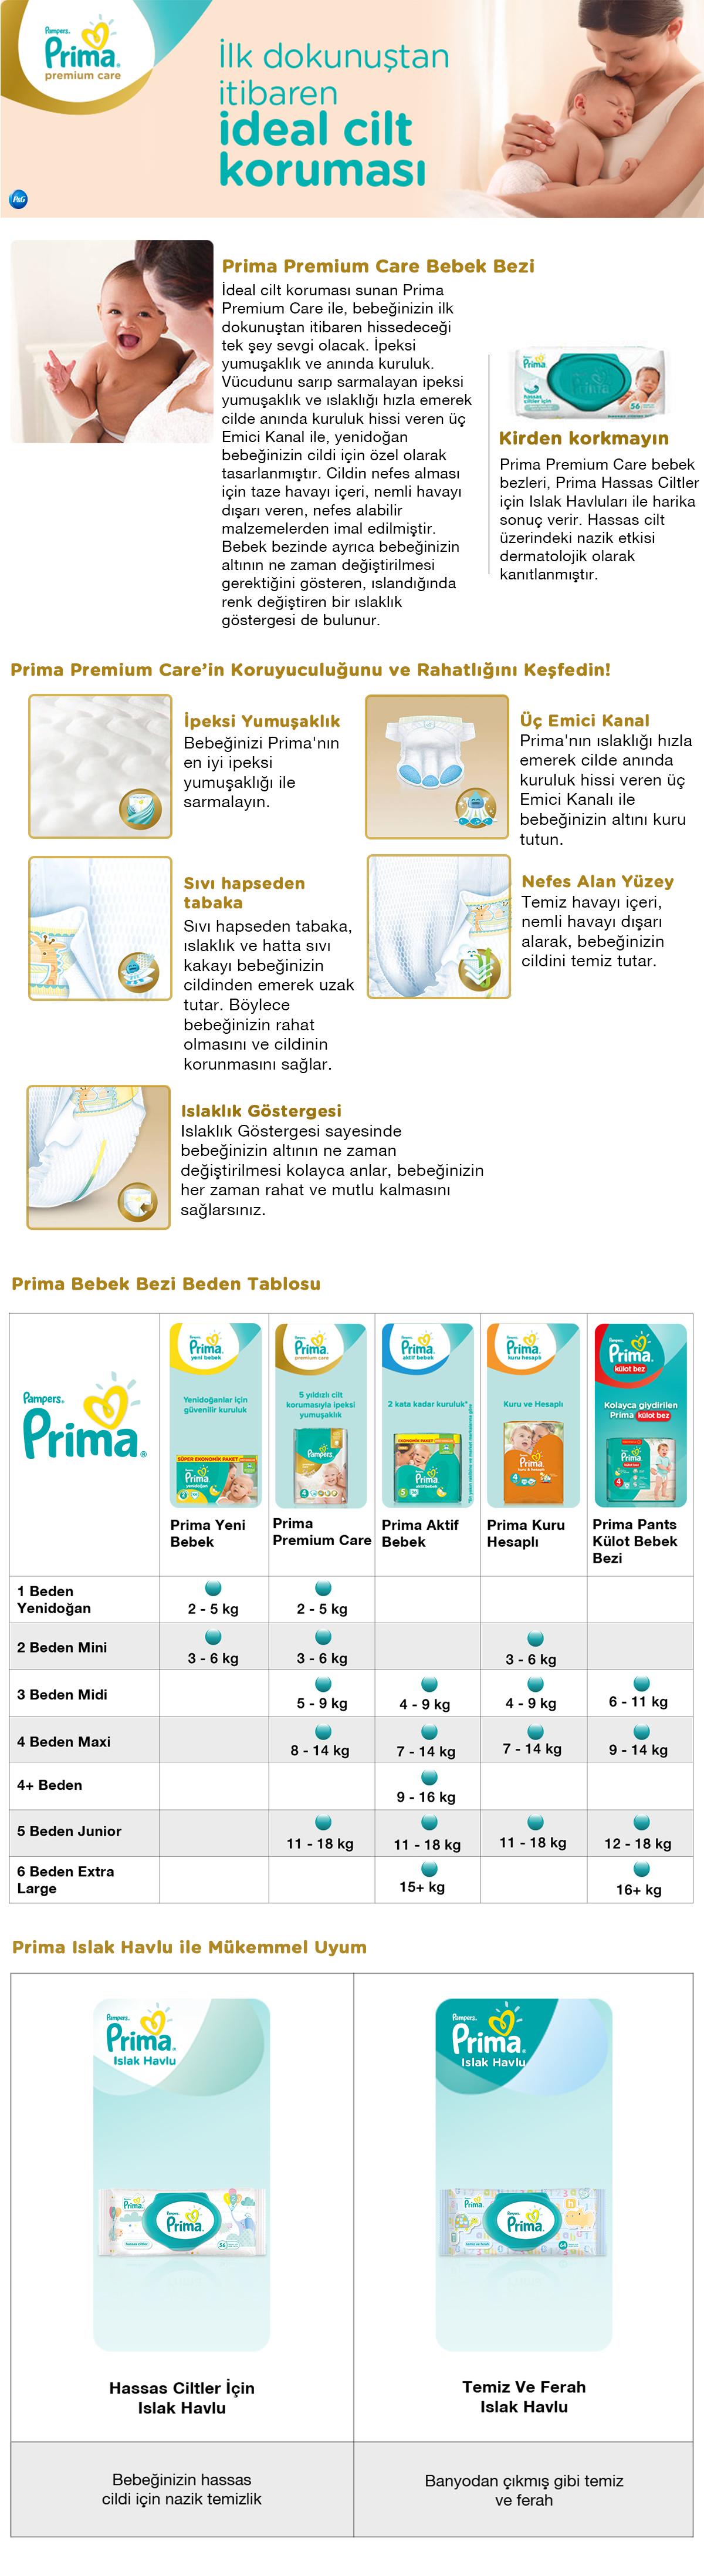 Delist Prima Bebek Bezi Premium Care Aylık Fırsat Paketi 4 Beden Maxi 168 Adet